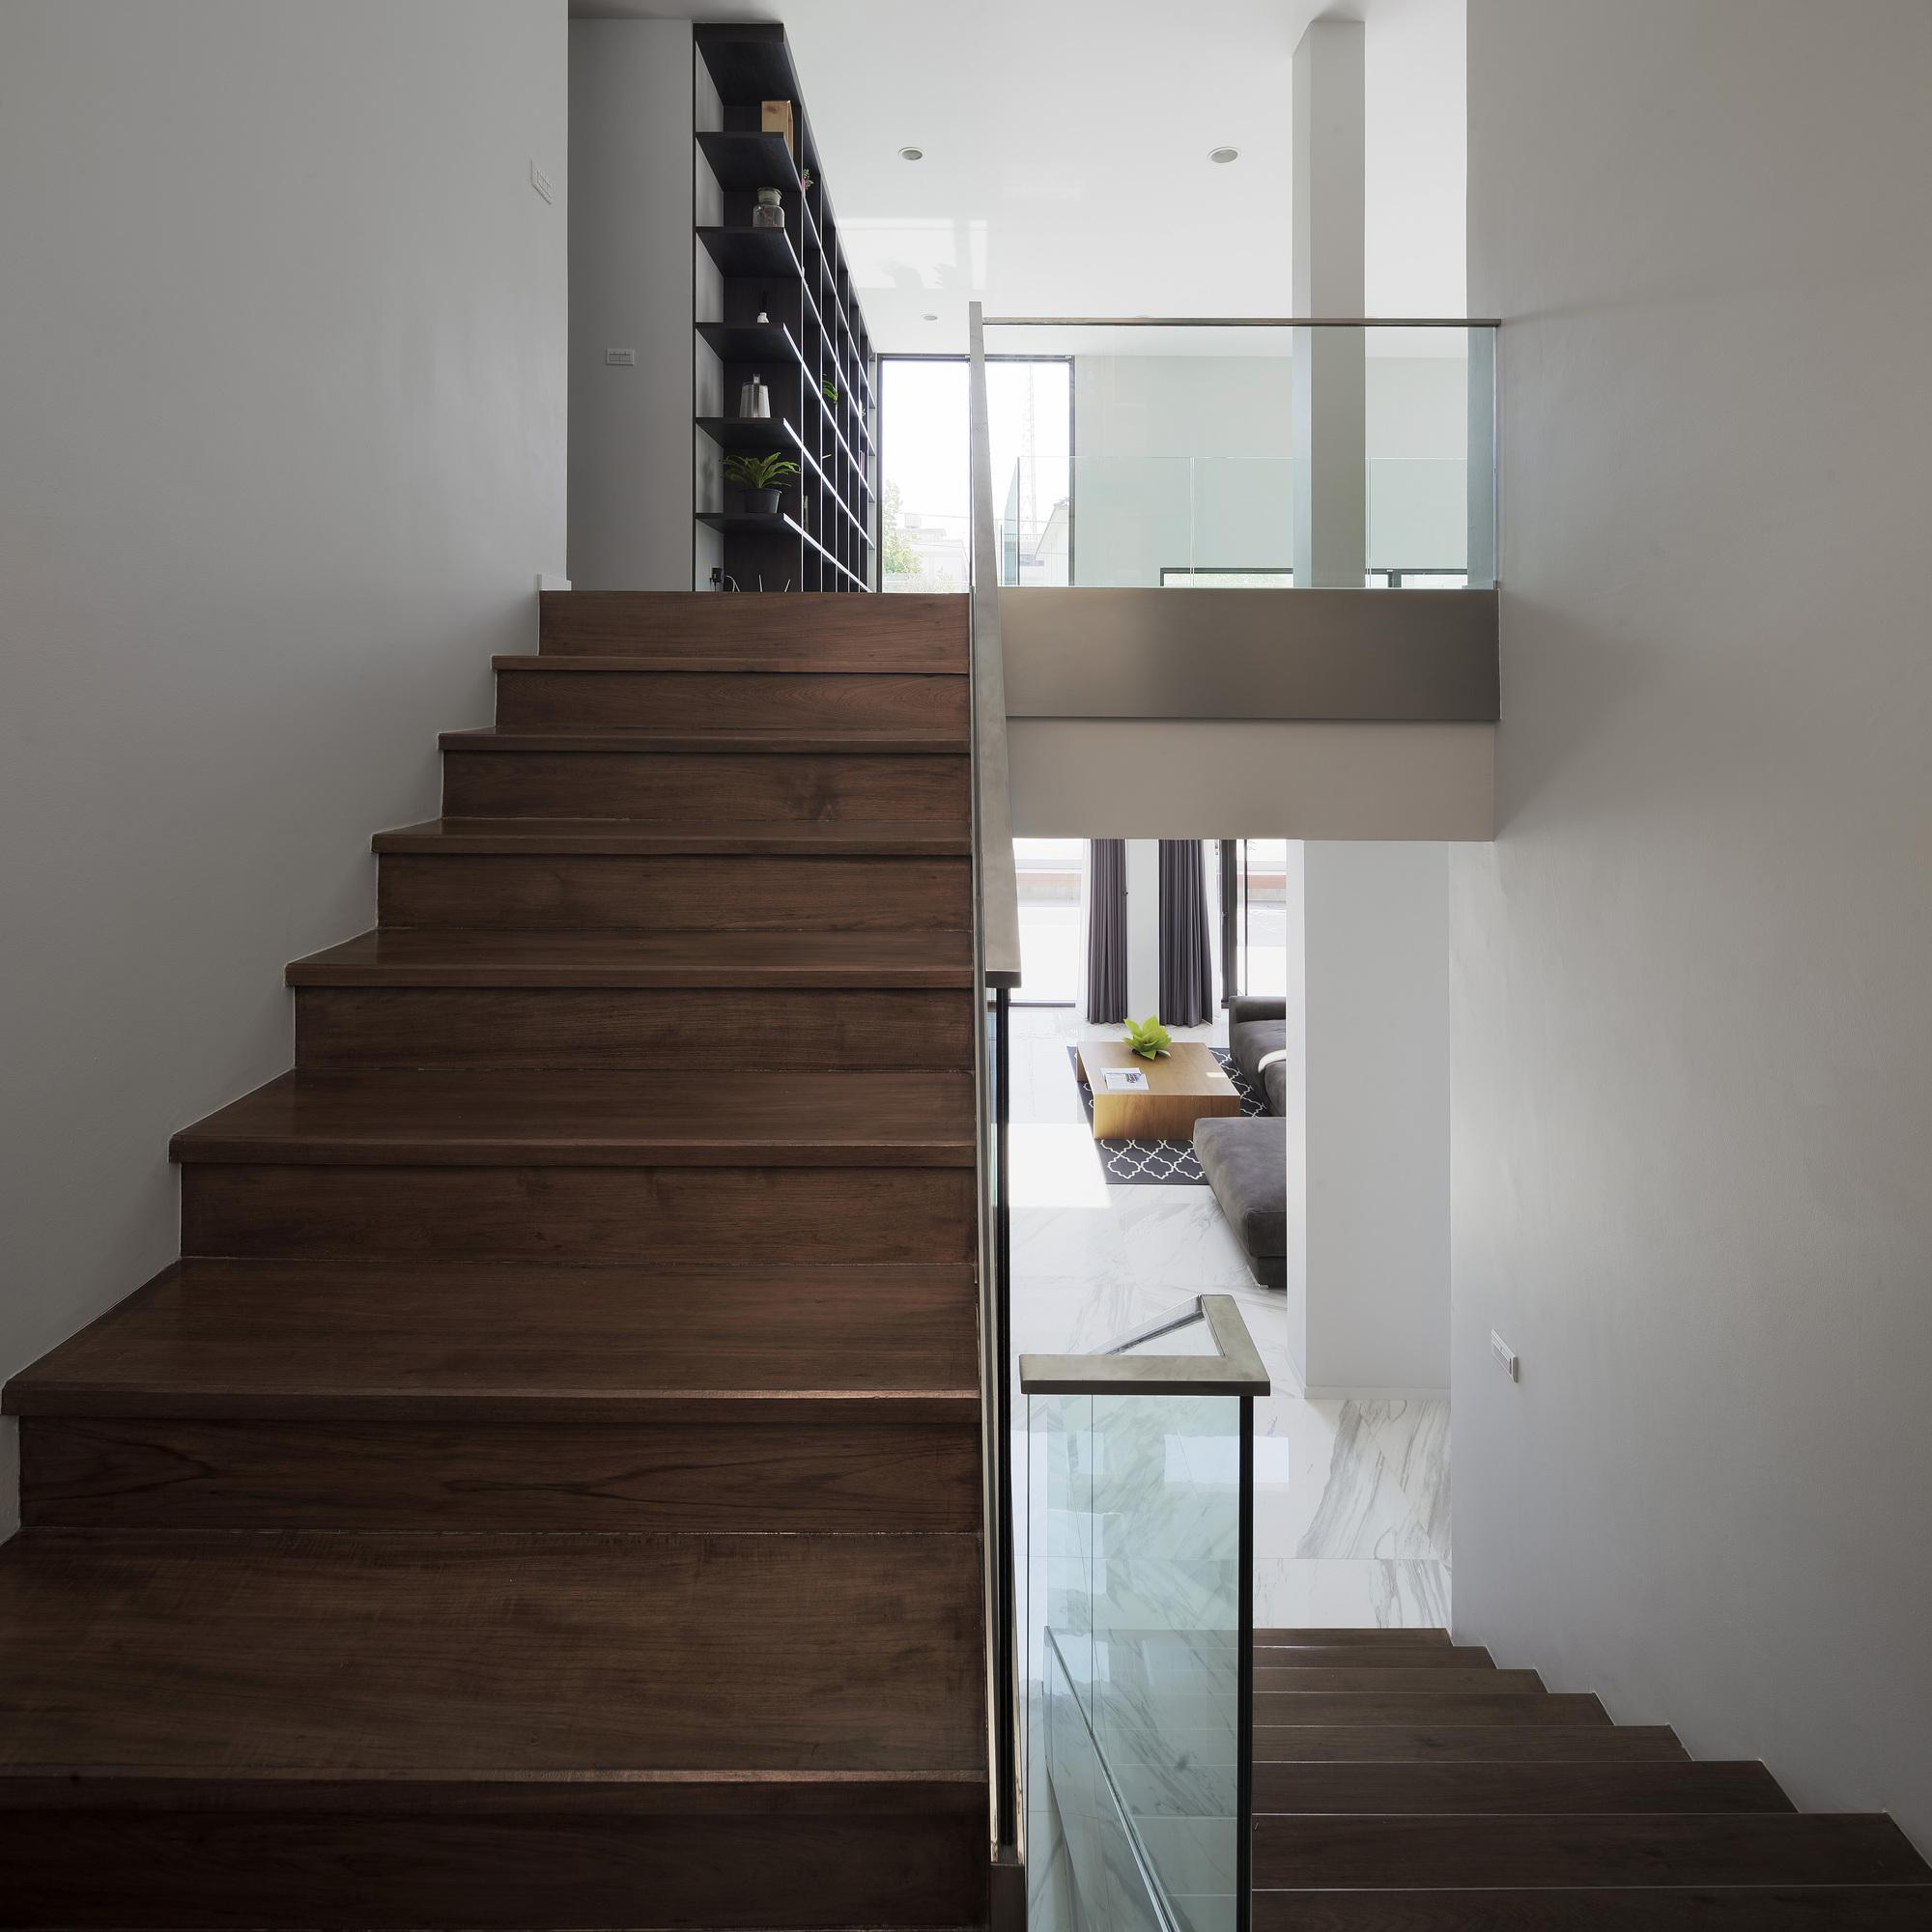 Home Design Studio Pro 15: Gallery Of Intamara 29 House / I Like Design Studio